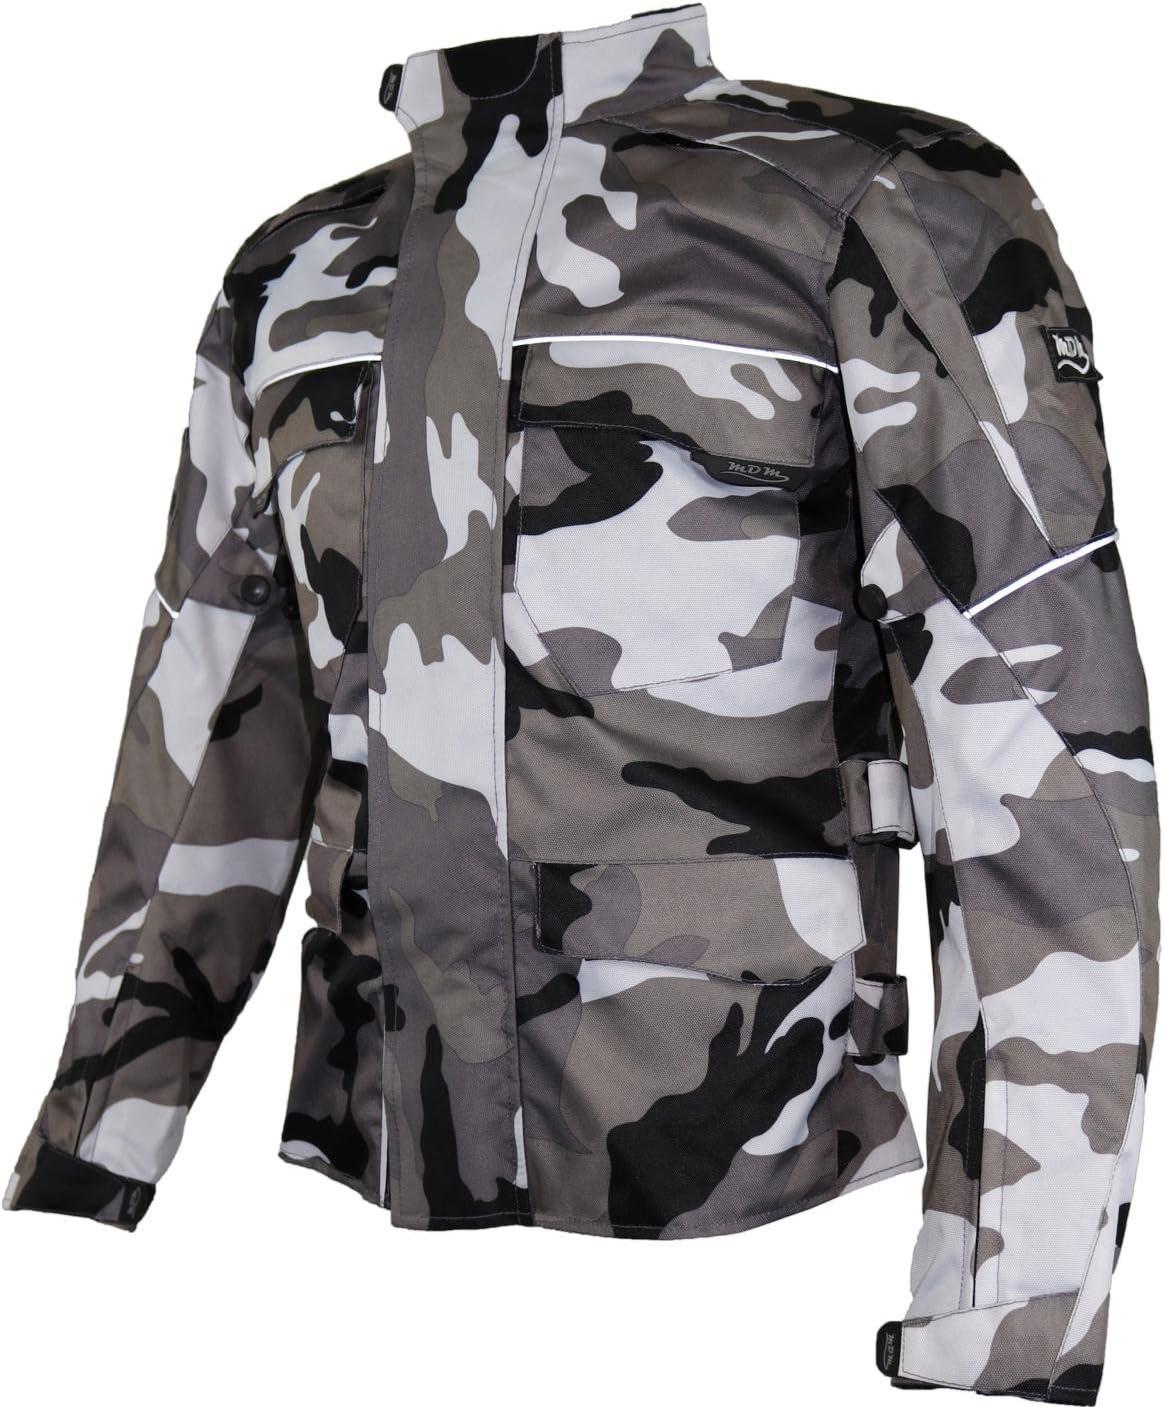 3XL MDM Motorrad Textil Jacke Motorradjacke Racing Wasserdicht Schutzjacke Sommer Camo Camouflage